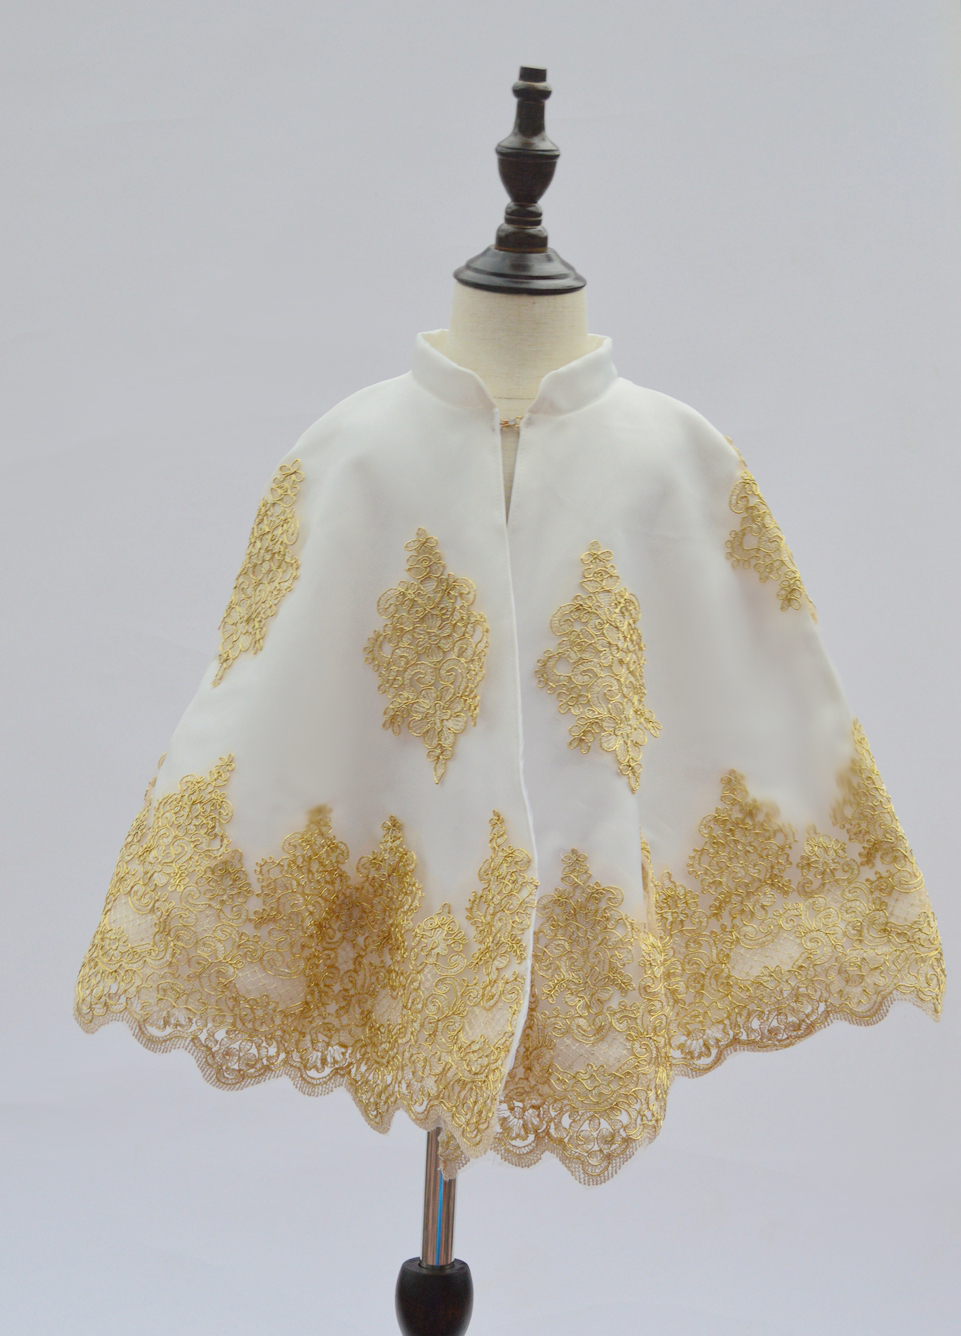 US $54 0 |Woman Bolero Brand banquet party graduation prayer Jesus cross  church dress shawl cape waistcoat girl baby embroidery cloak cape-in  Matching